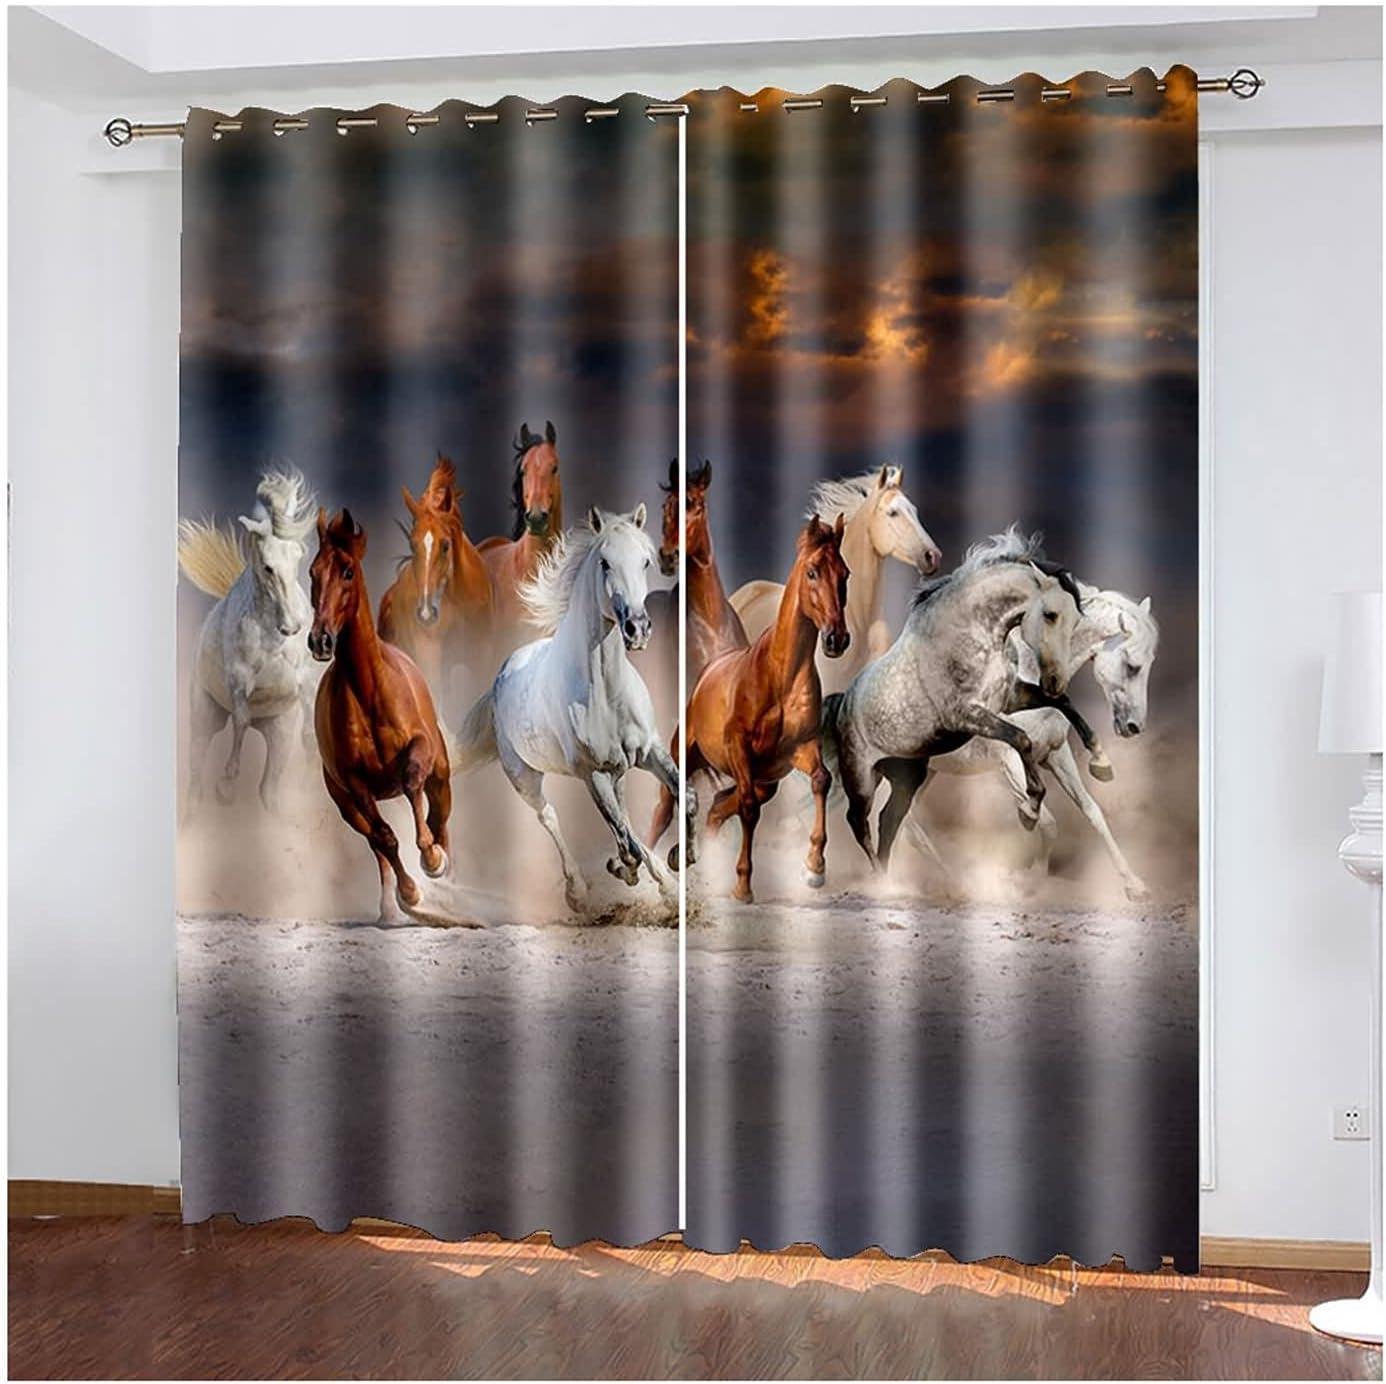 Bedroom Blackout Curtains 2 Panel Large-scale sale for Sets Sale Drapes Livi